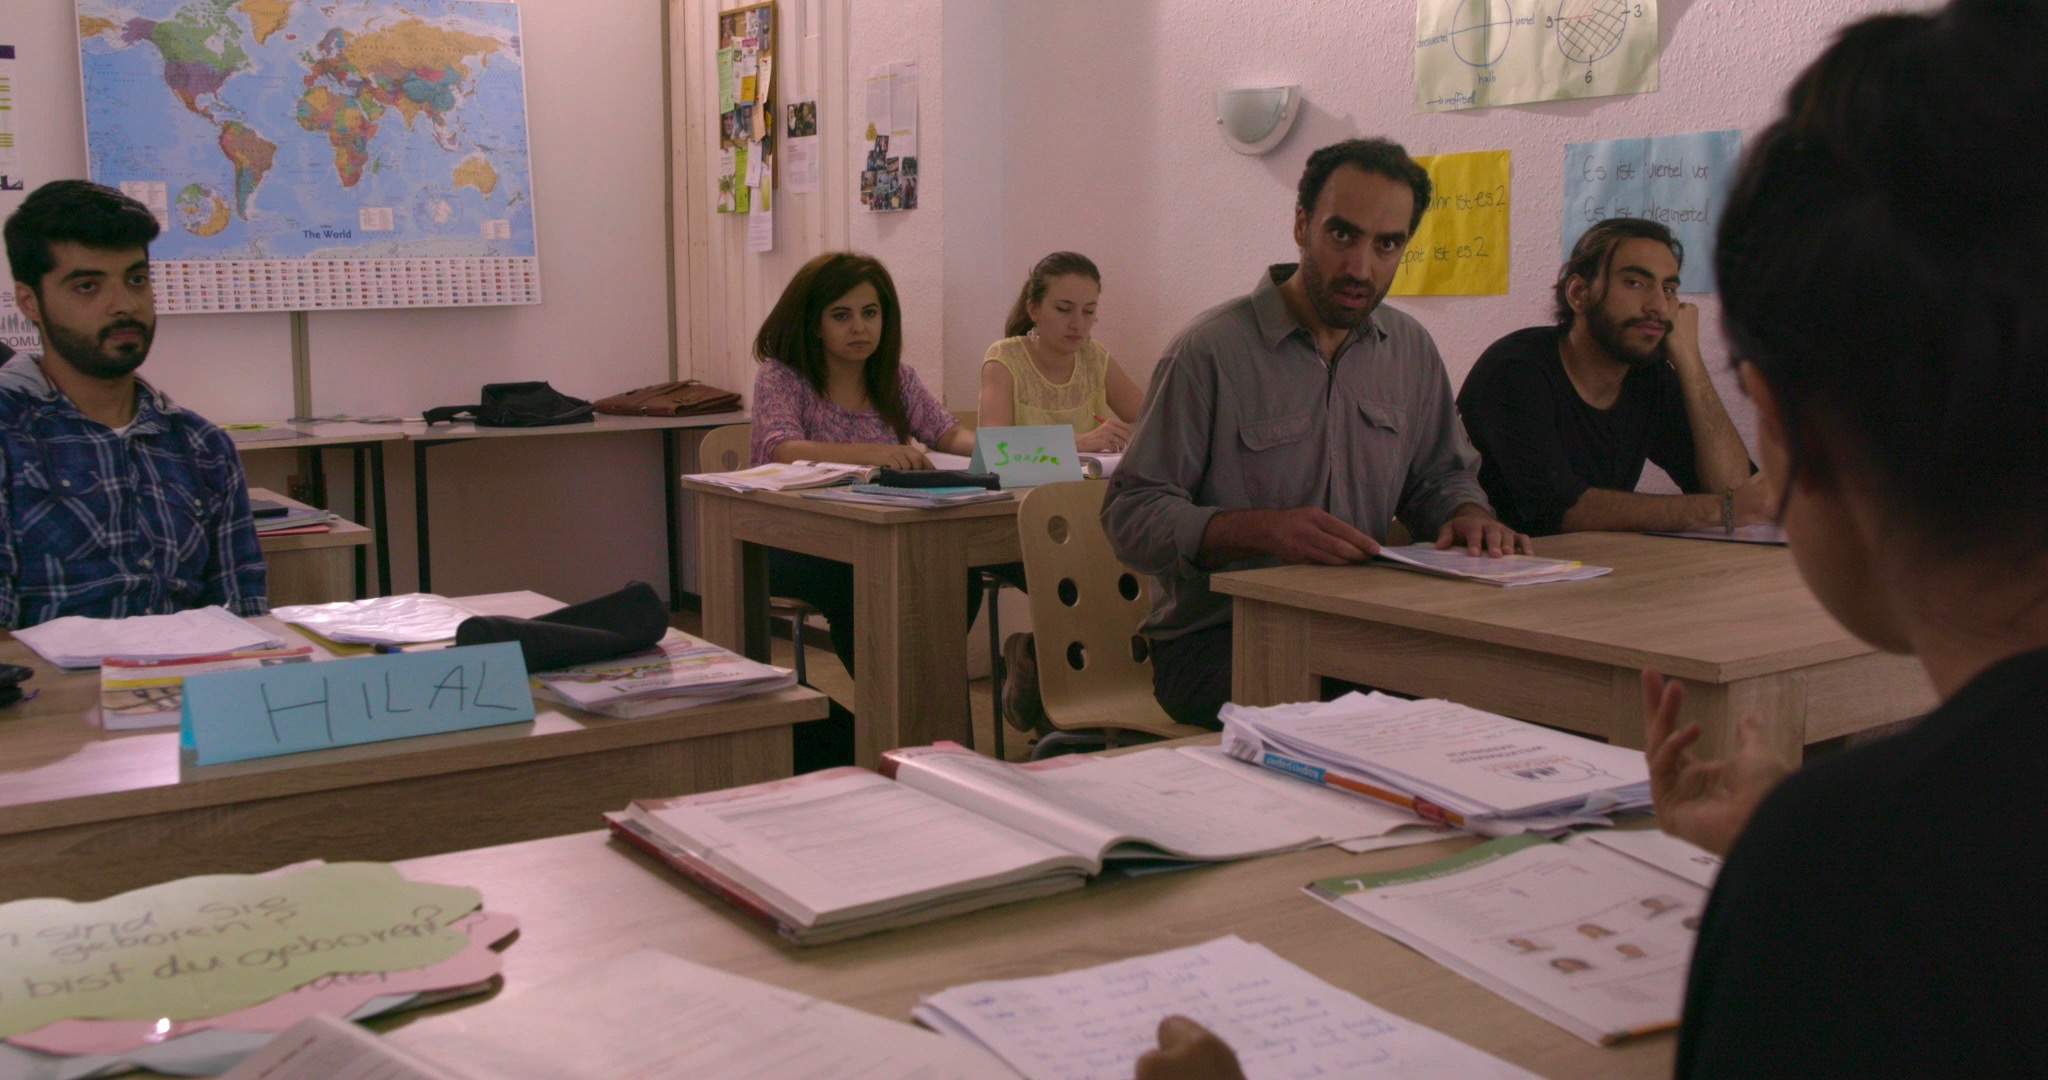 German language classroom scene